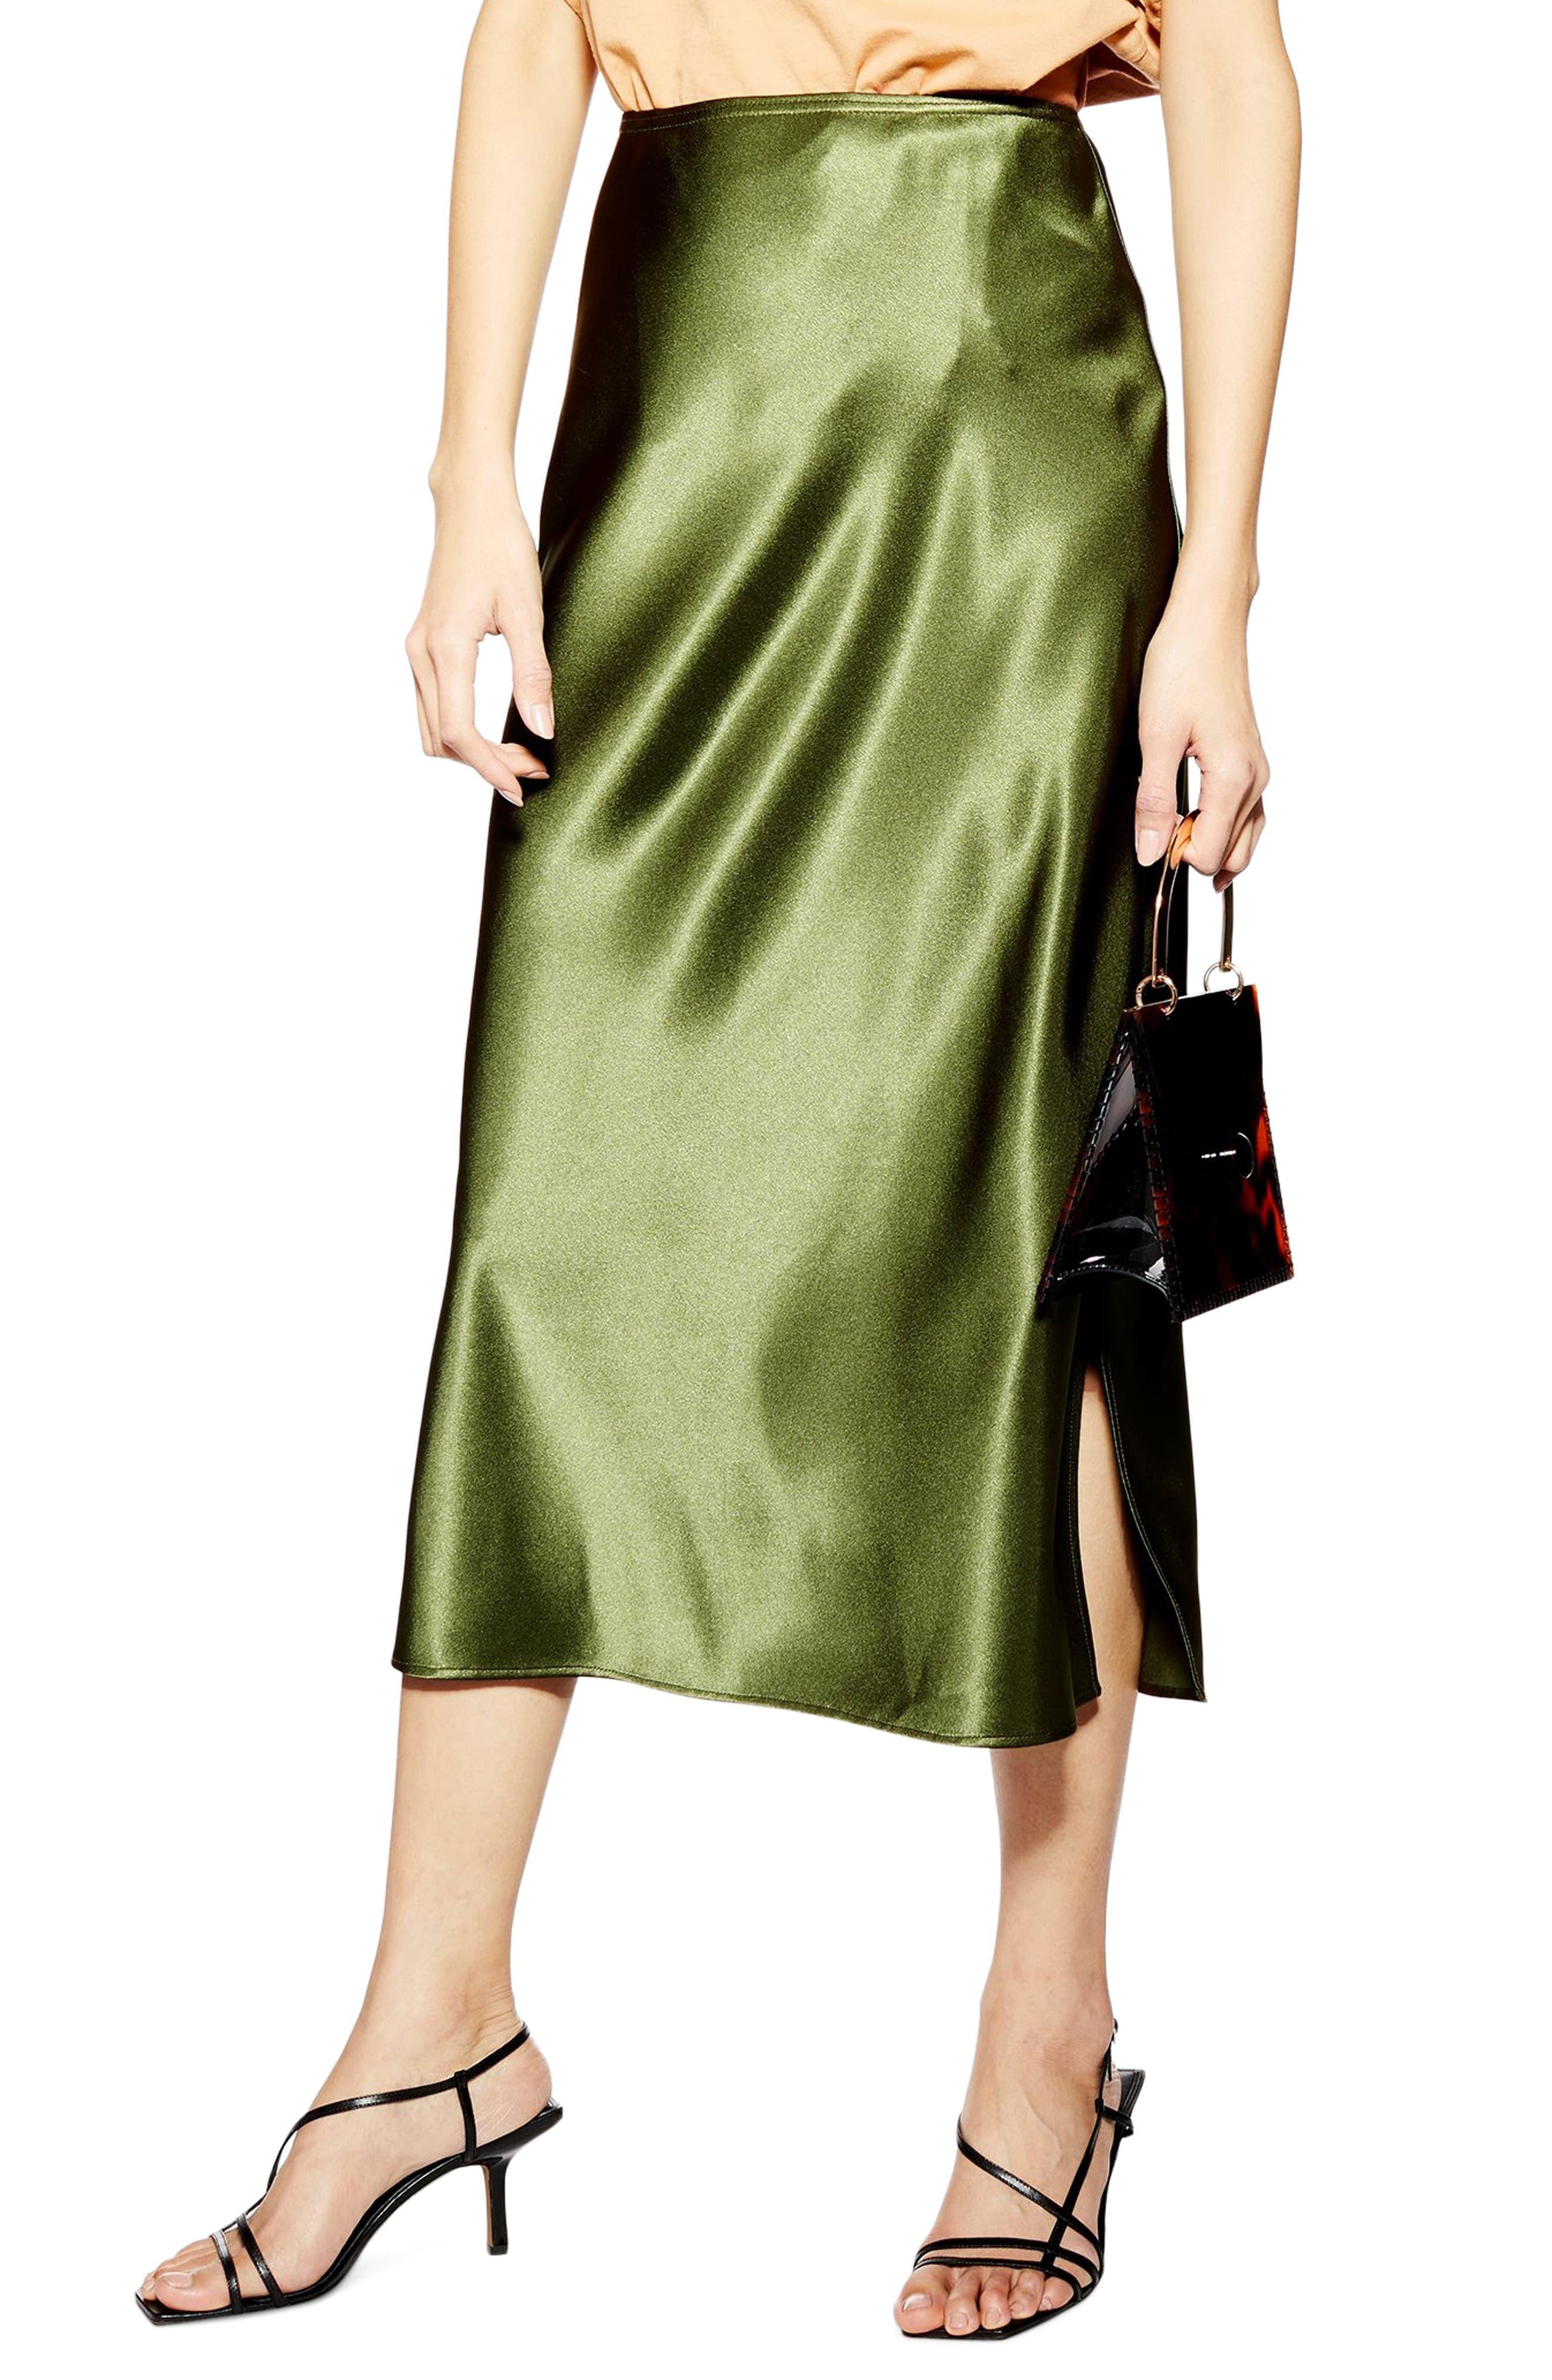 Women's Clothing T Alexander Wang Black Silk Maxi Skirt Small High Quality Materials Skirts